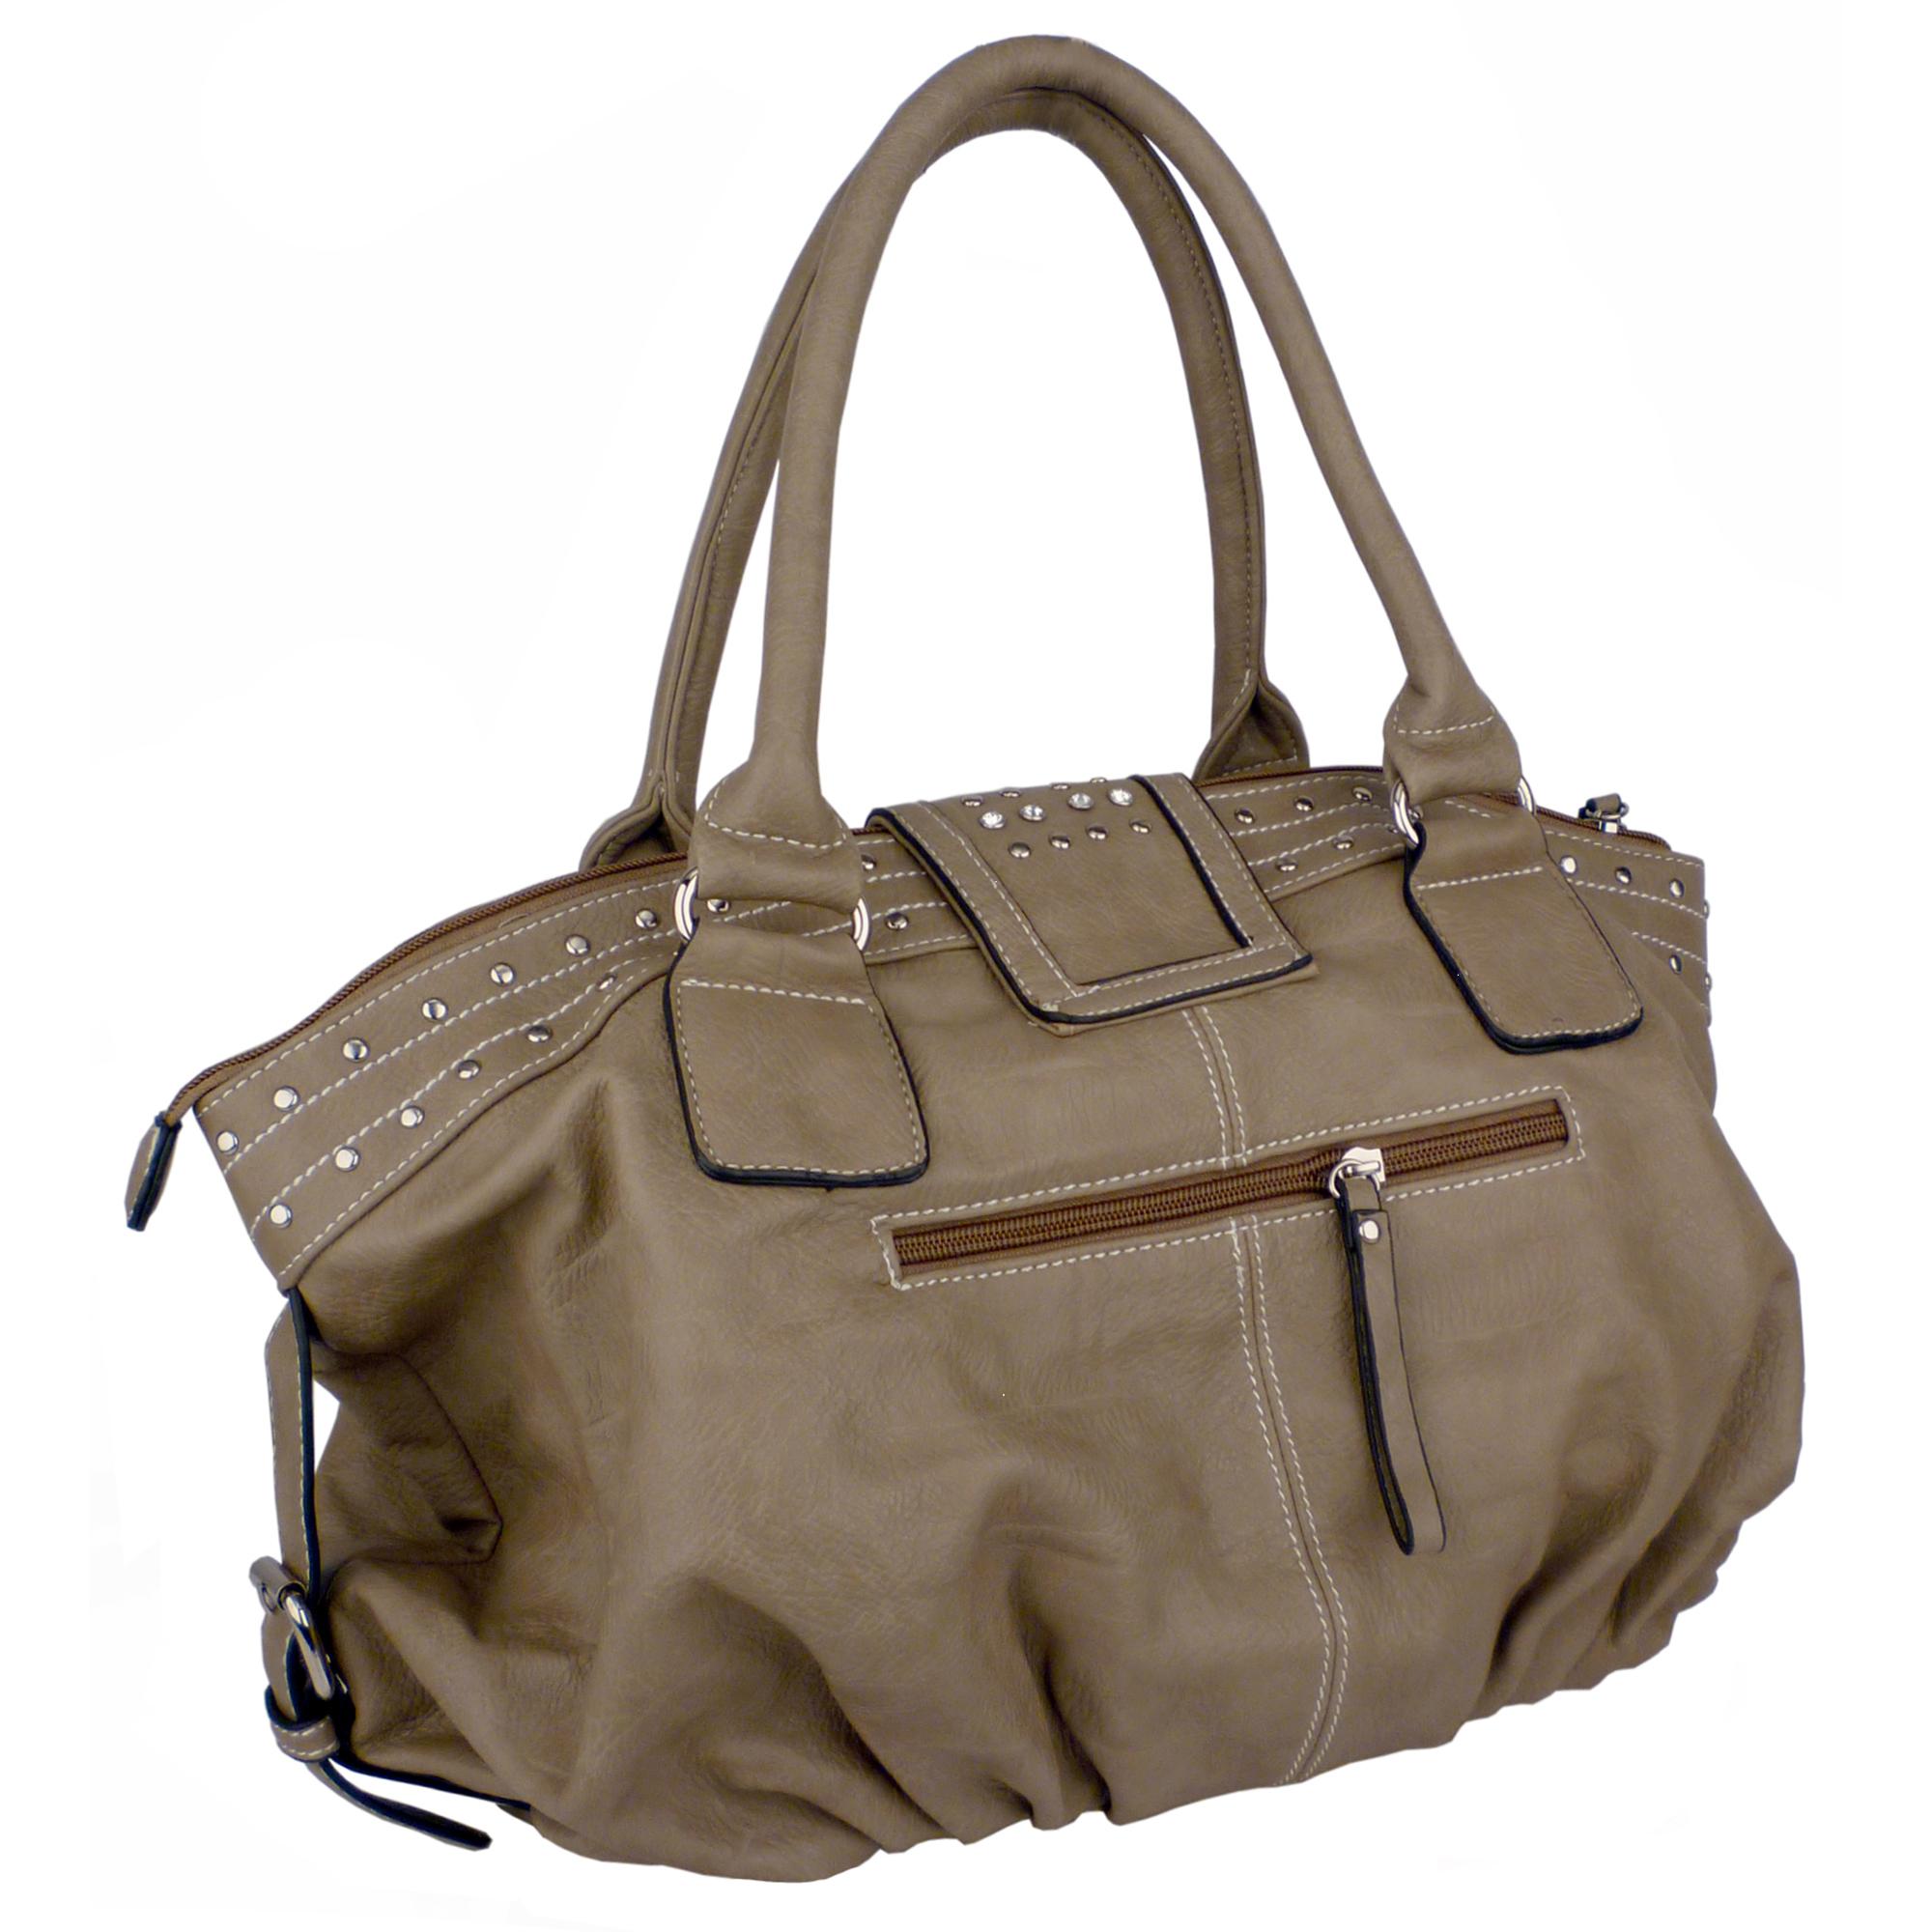 BRENNA Camel Studded Soft Shopper Style Hobo Handbag Angled 2